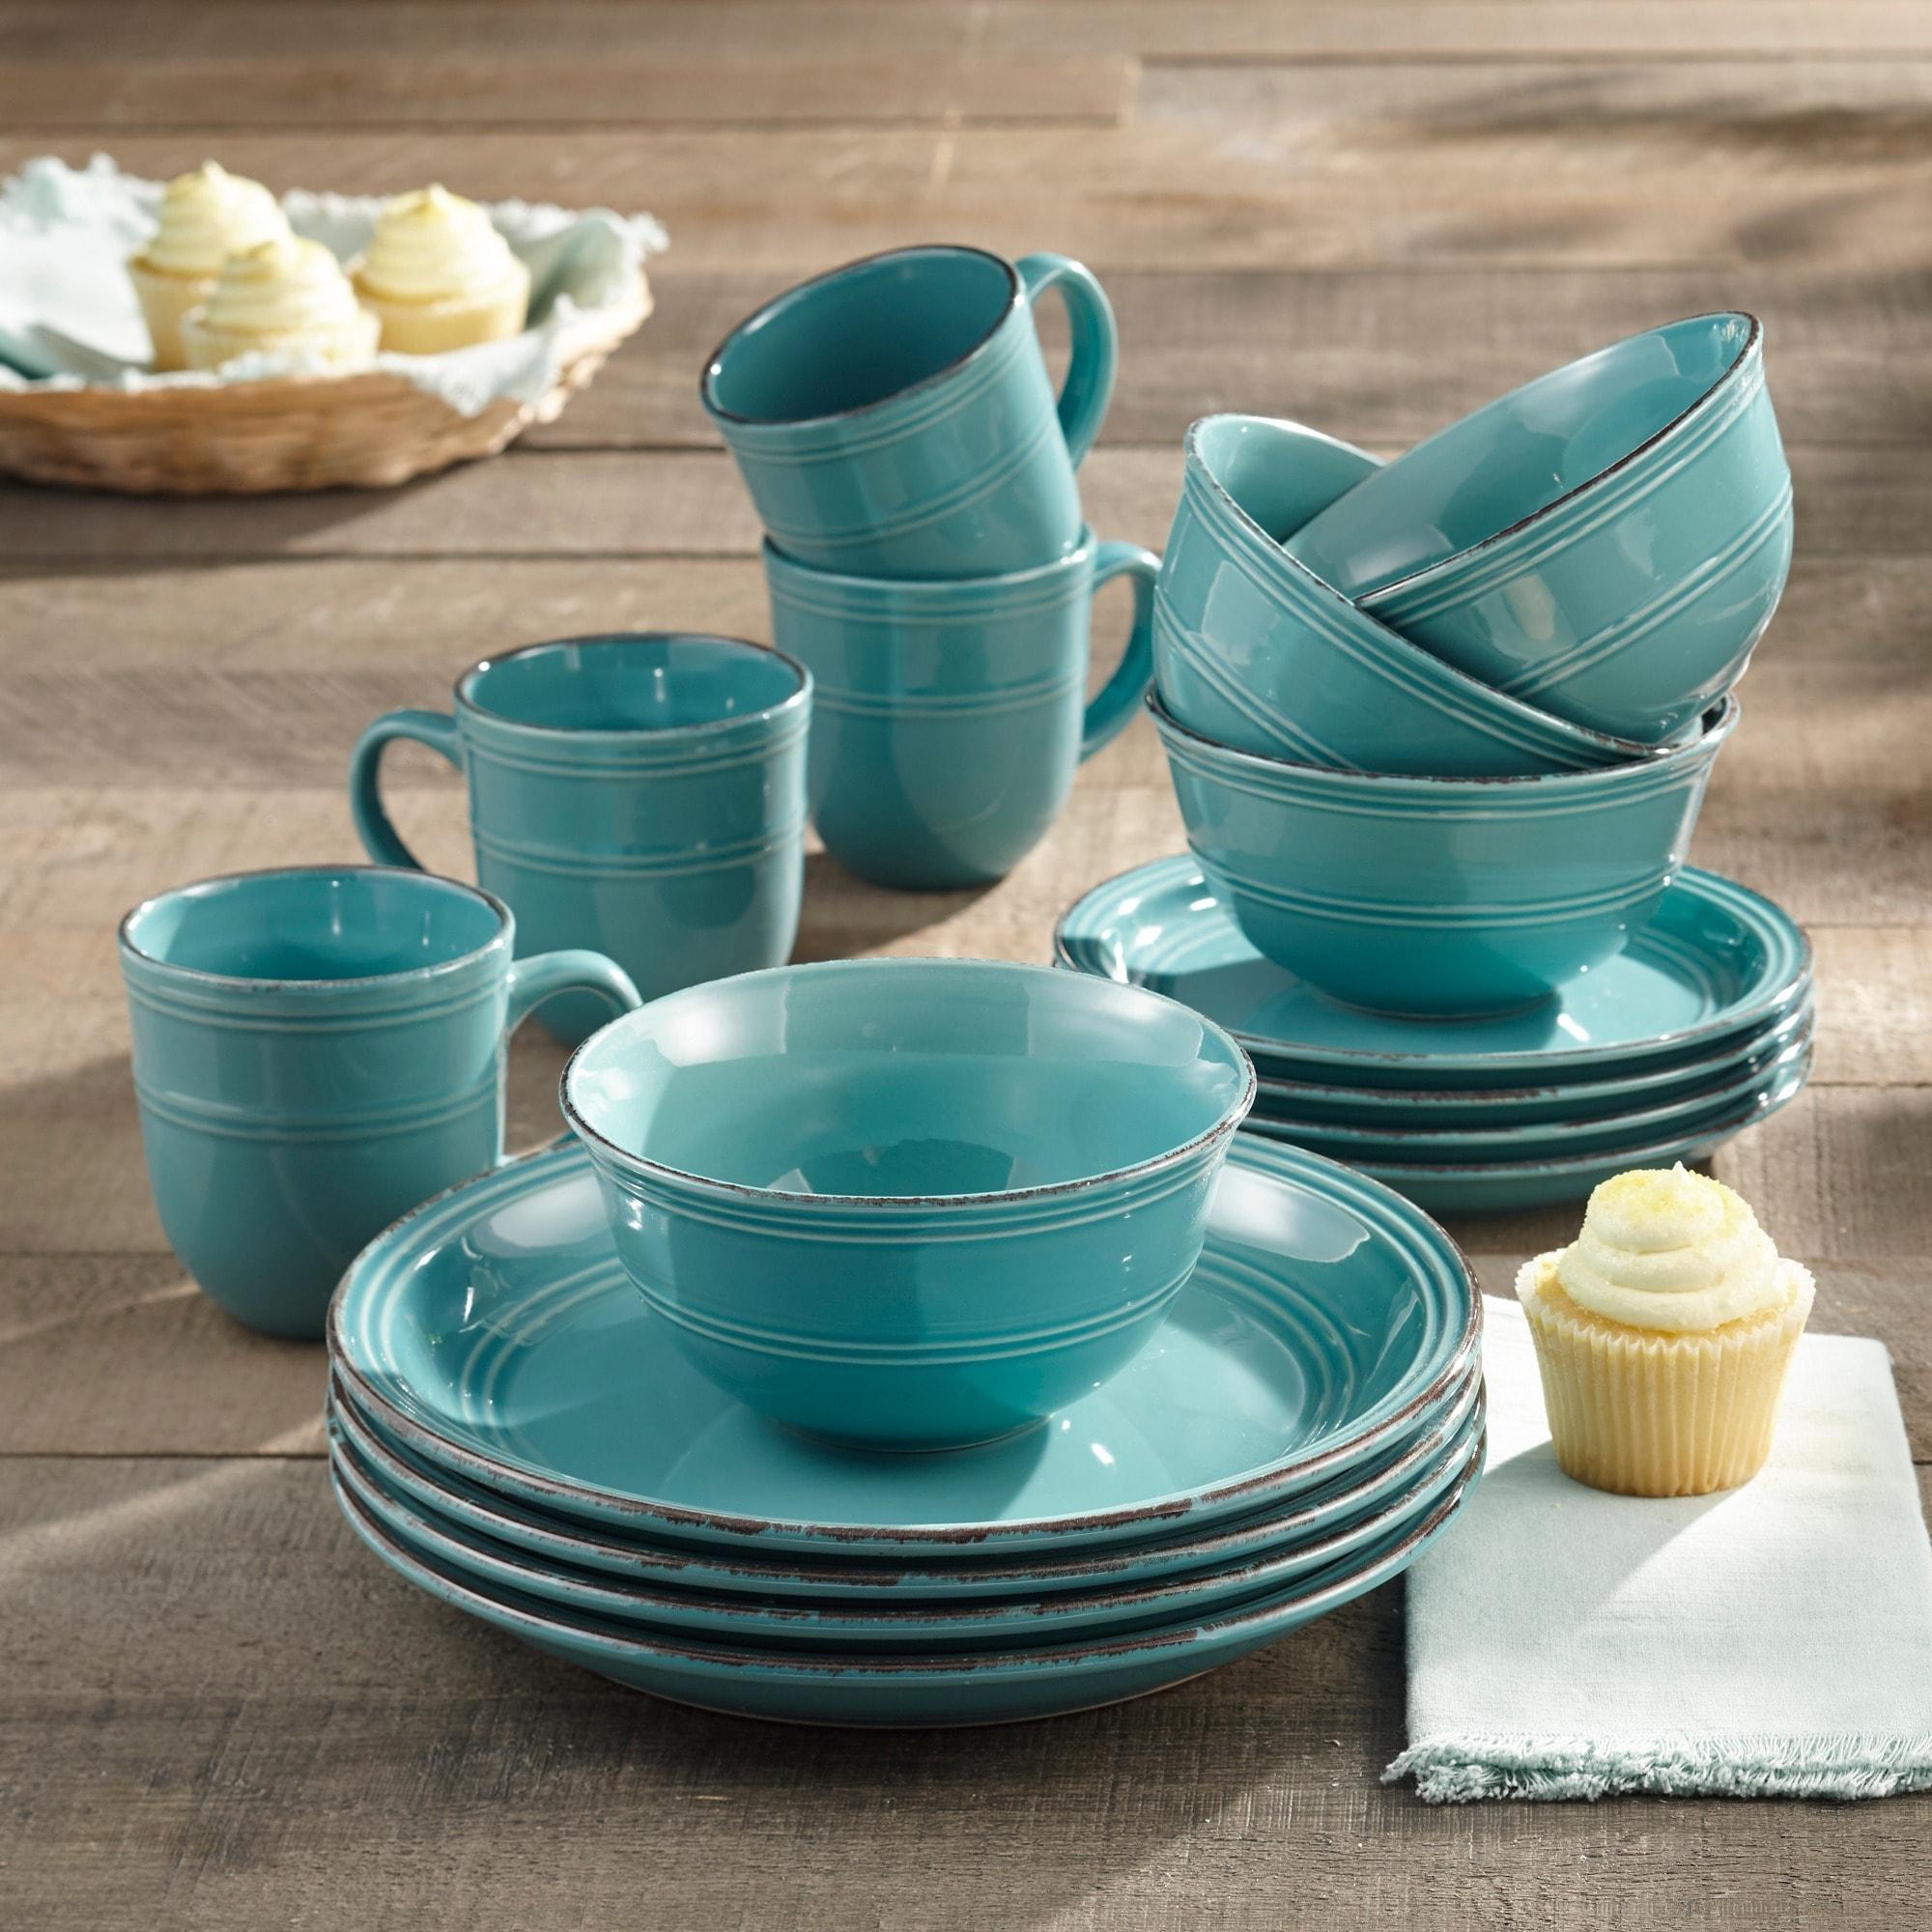 American Atelier Madelyn Aqua-blue Earthenware 16-piece Dinnerware Set - Free Shipping Today - Overstock - 18894080 & American Atelier Madelyn Aqua-blue Earthenware 16-piece Dinnerware ...